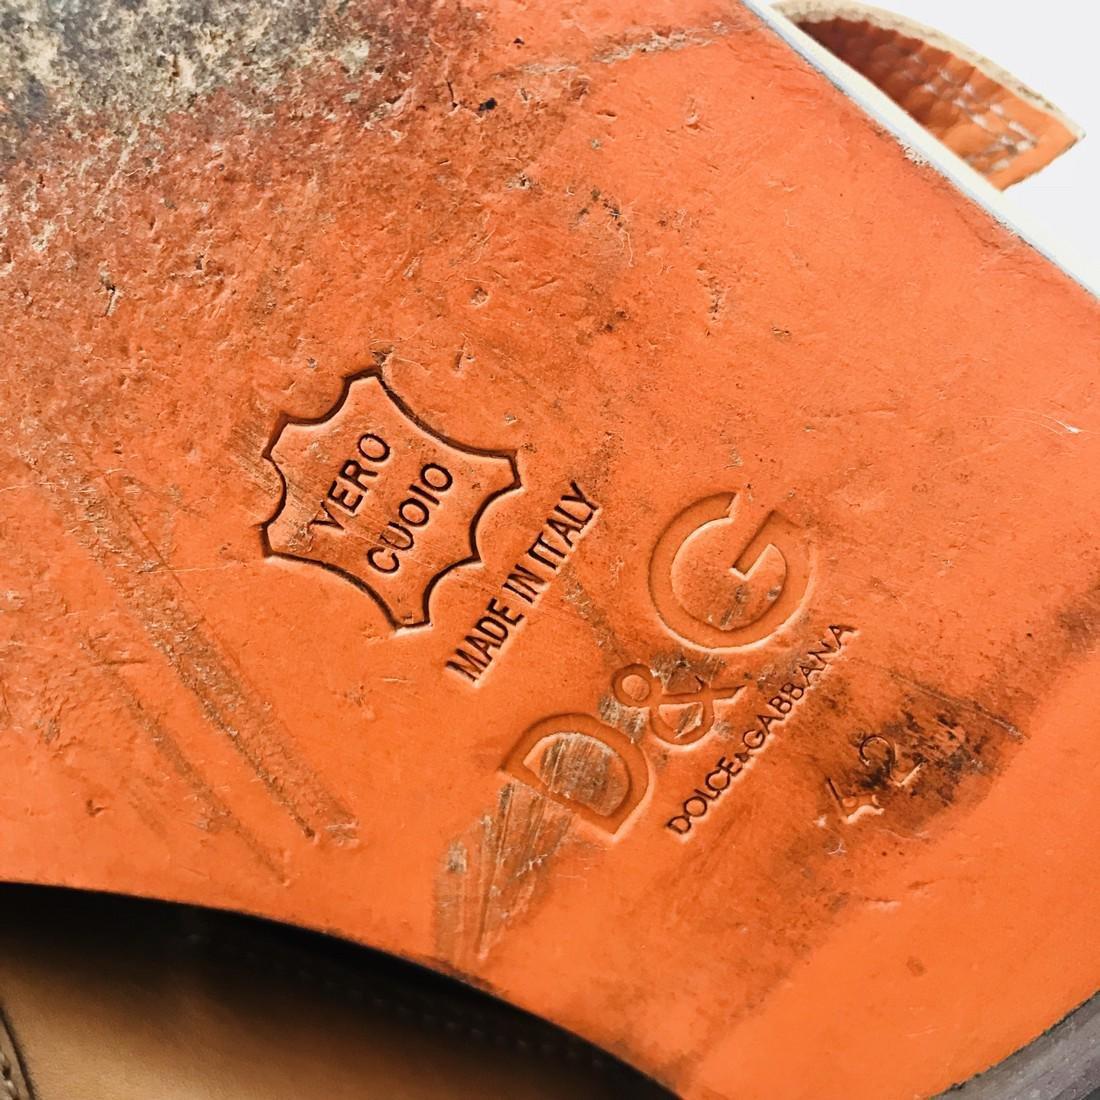 Dolce & Gabbana – Leather Shoes Size EUR 42 UK 8.5 US 9 - 9